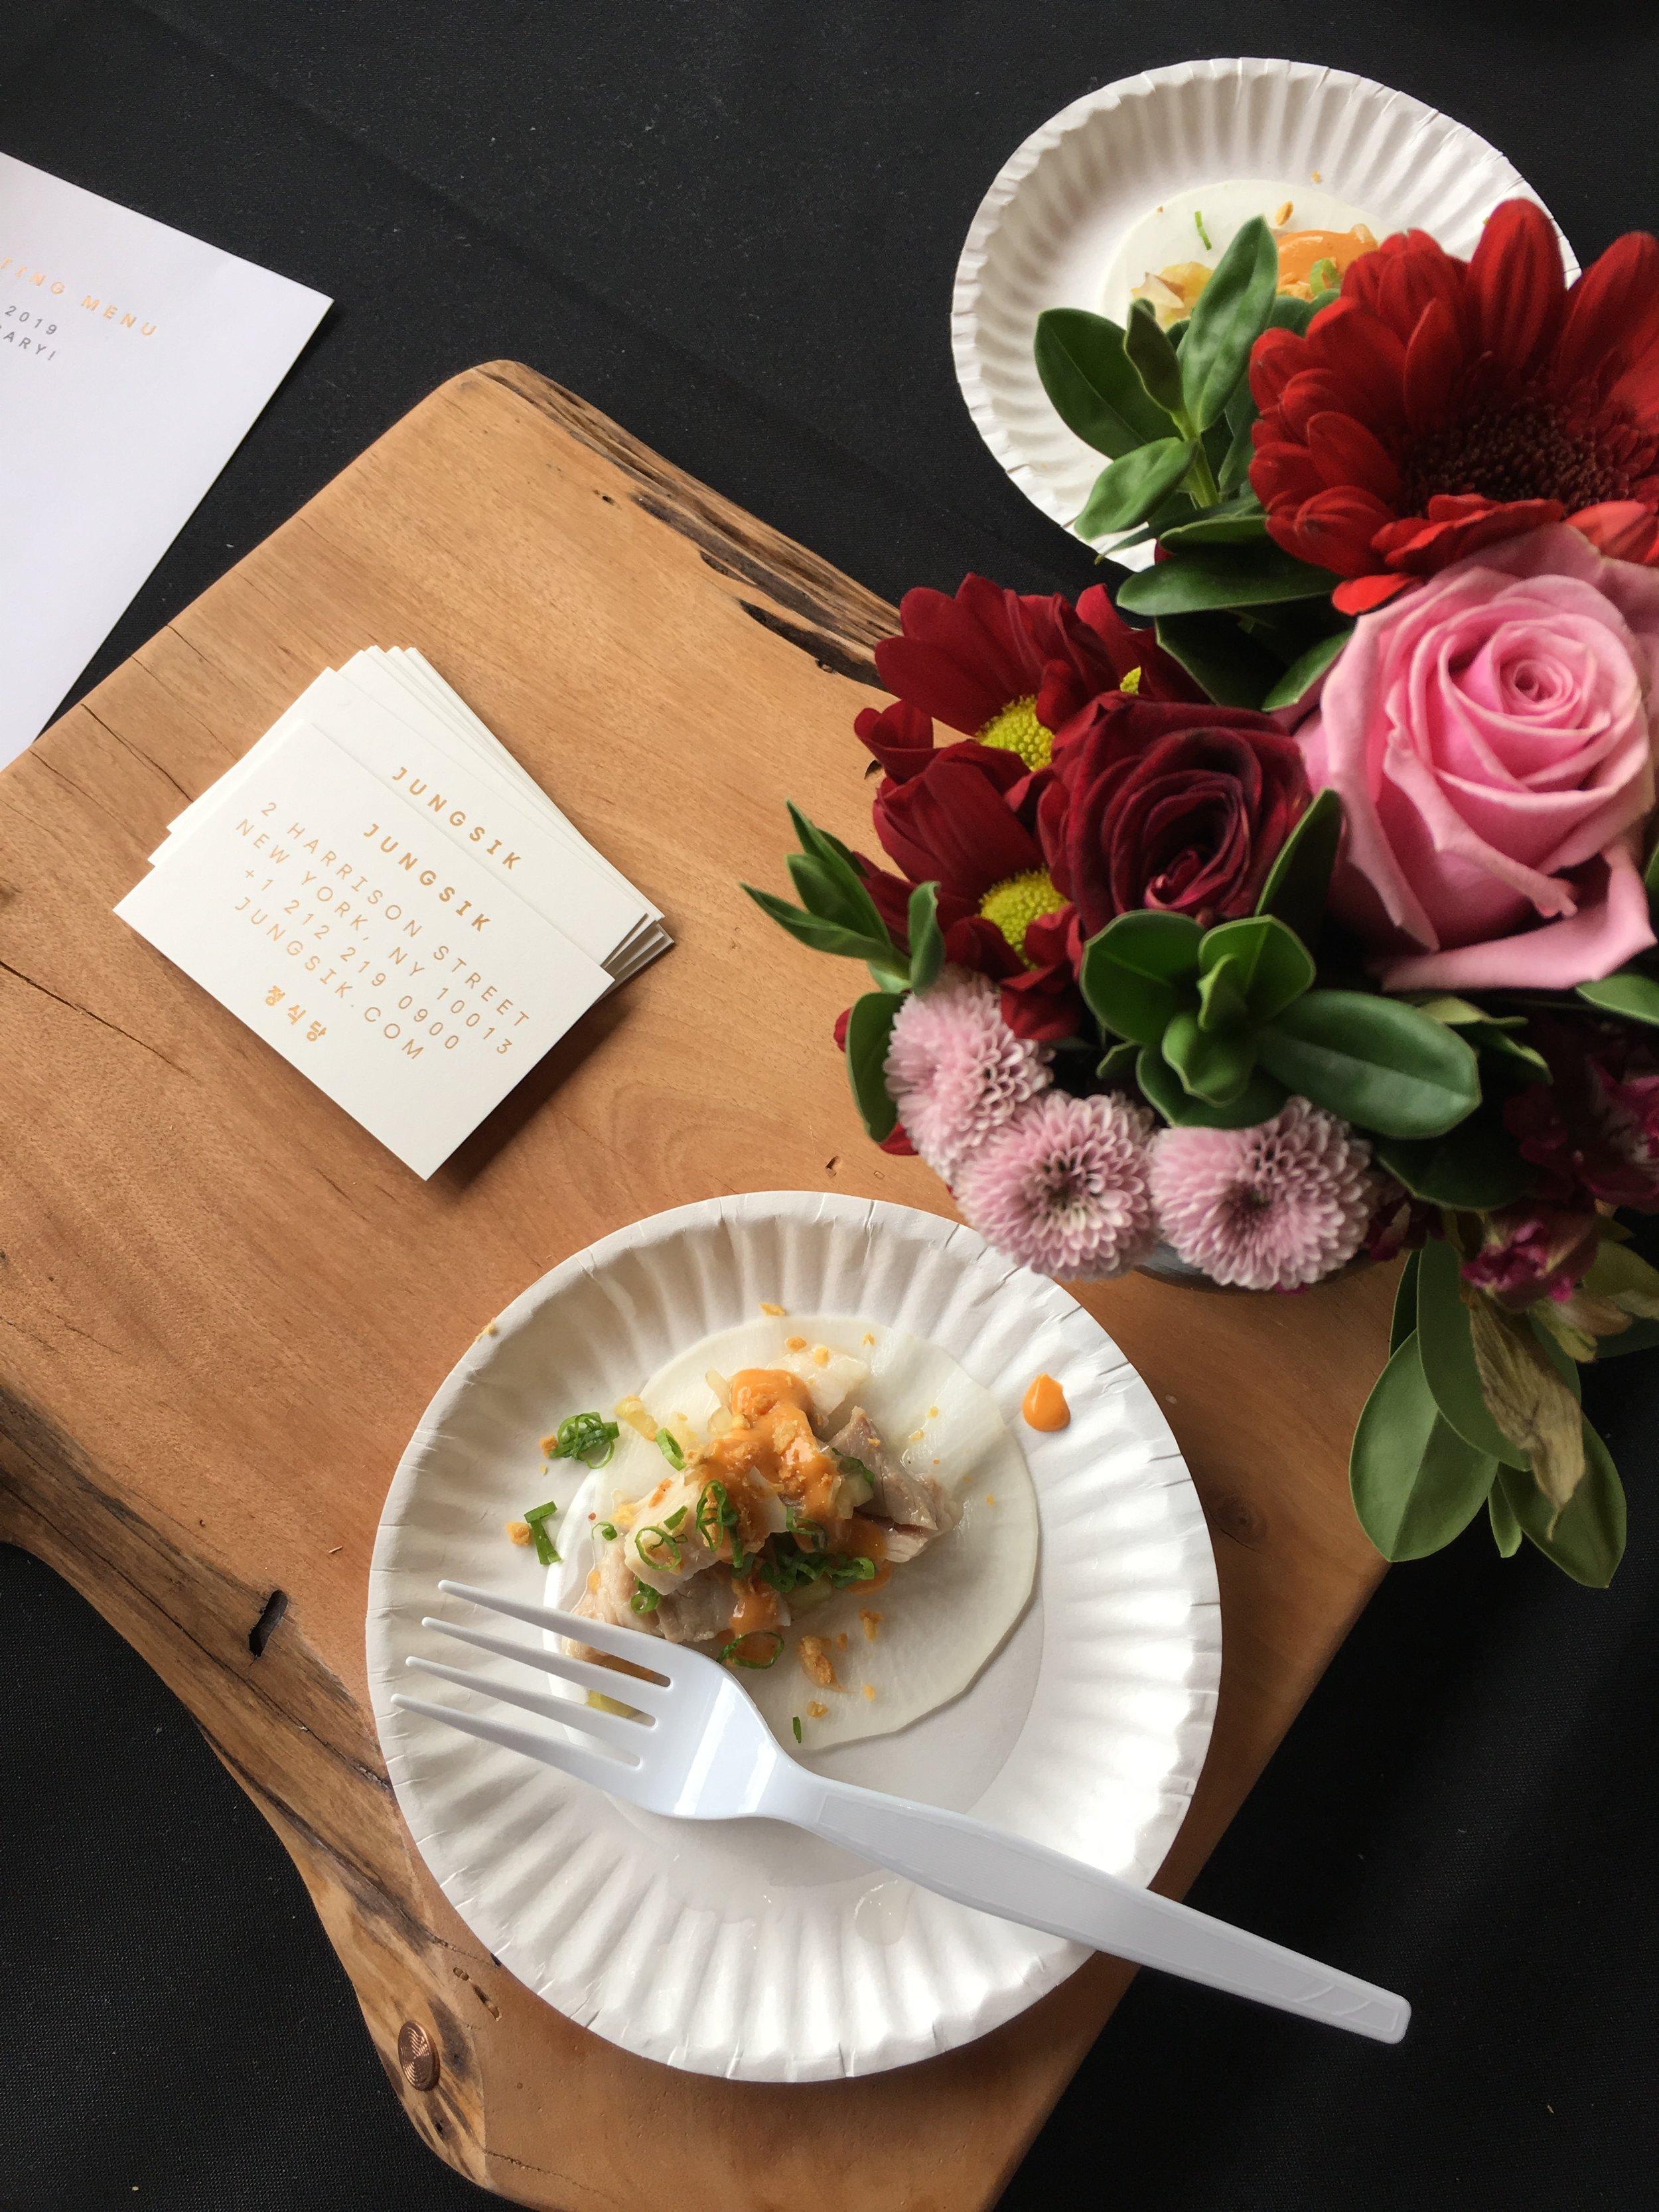 Braised Pork Belly Pickled Radish Wrap by Jungsik